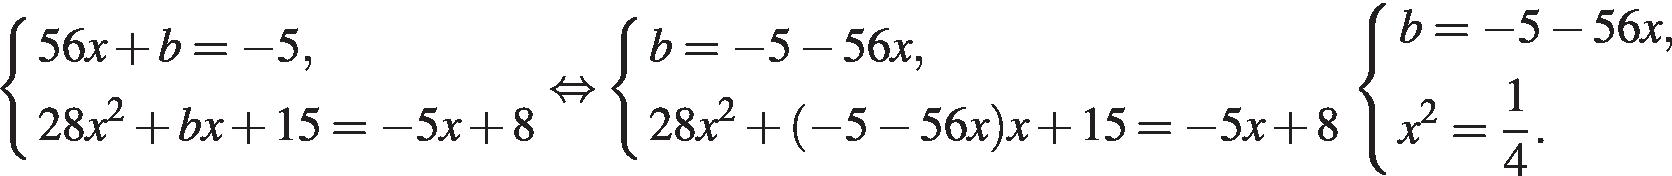 http://reshuege.ru/formula/f7/f7984e0569c736e063f4525b92c8055ap.png